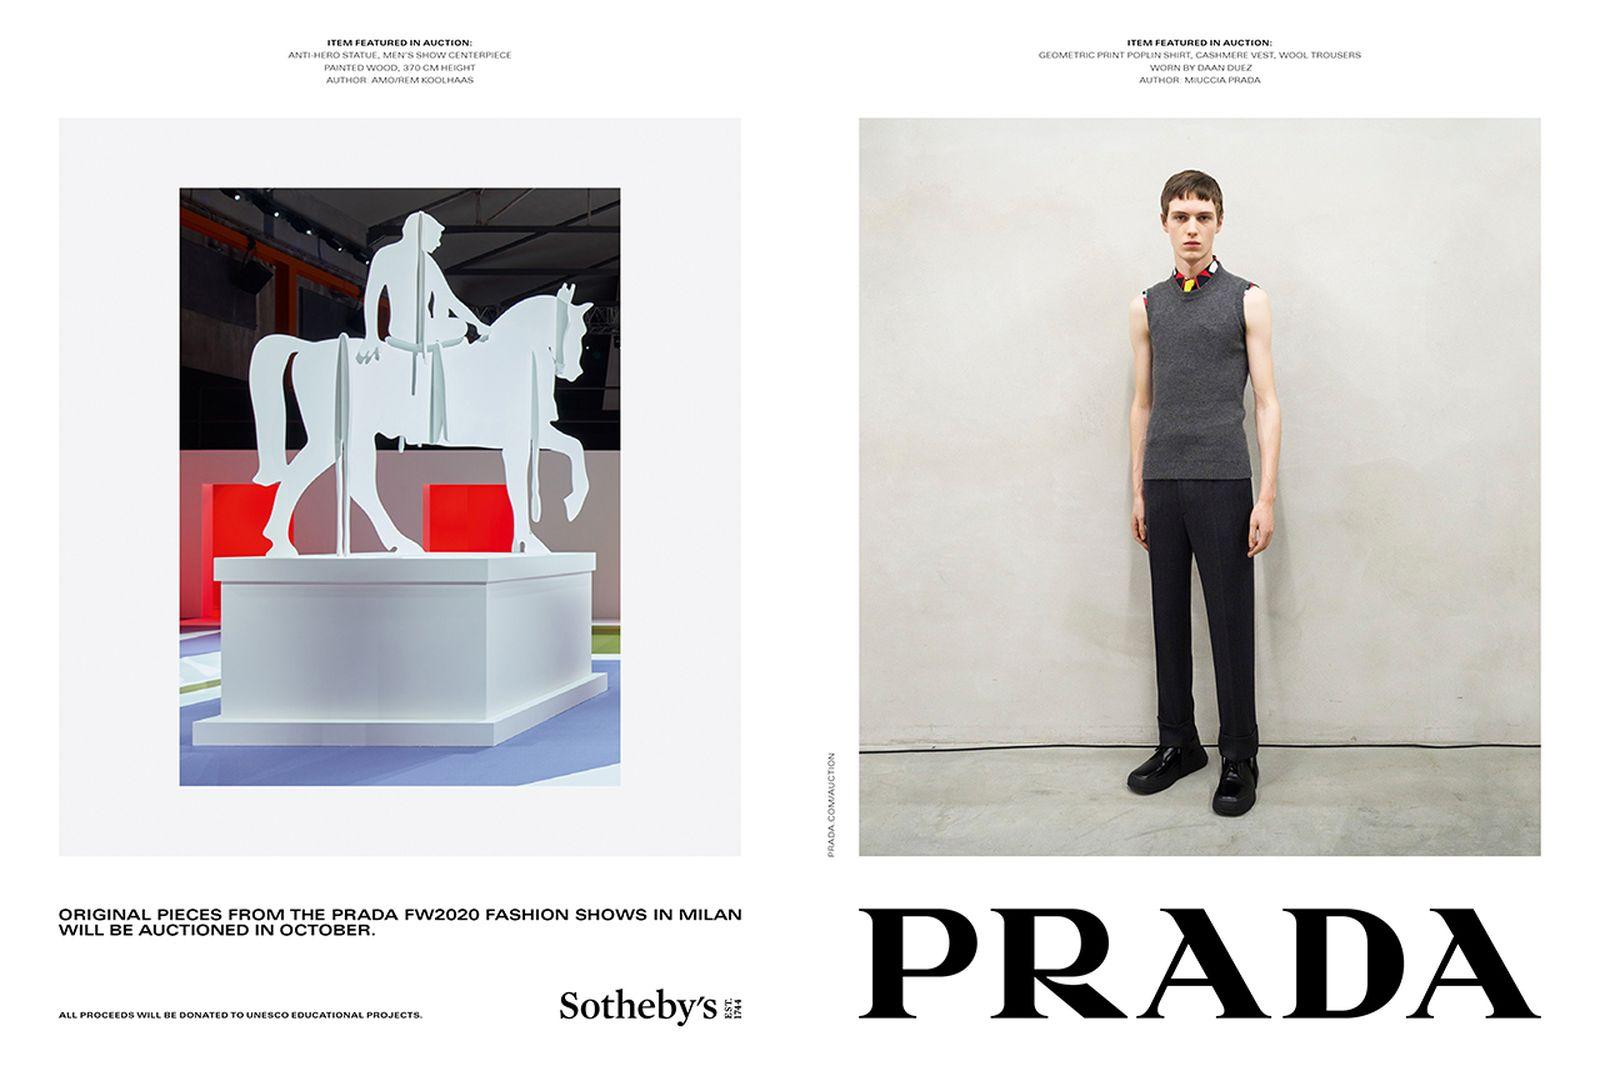 Prada x Sotheby's campaign image